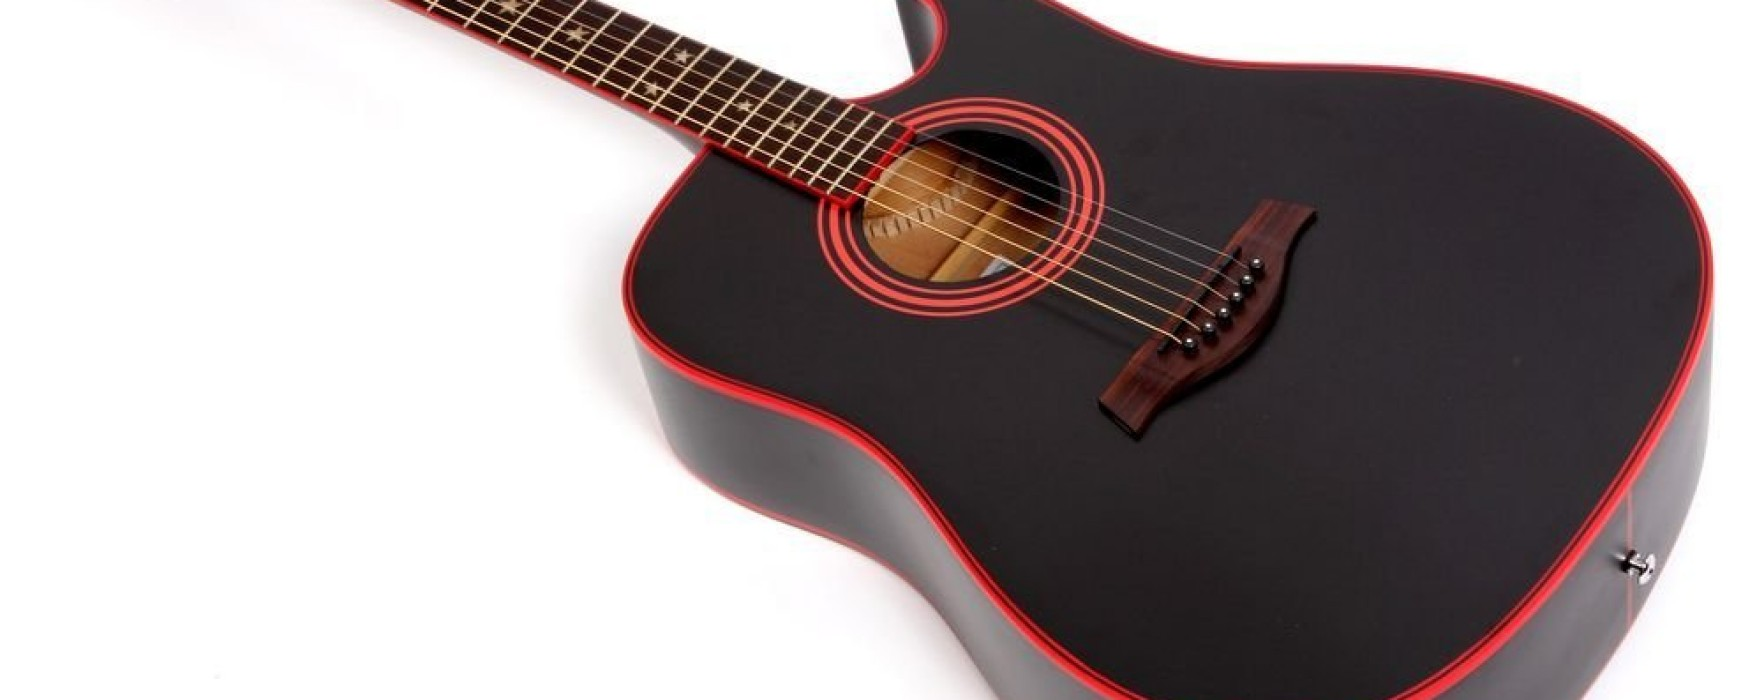 Lindo Guitars LDG-46 Widow Acoustic Guitar